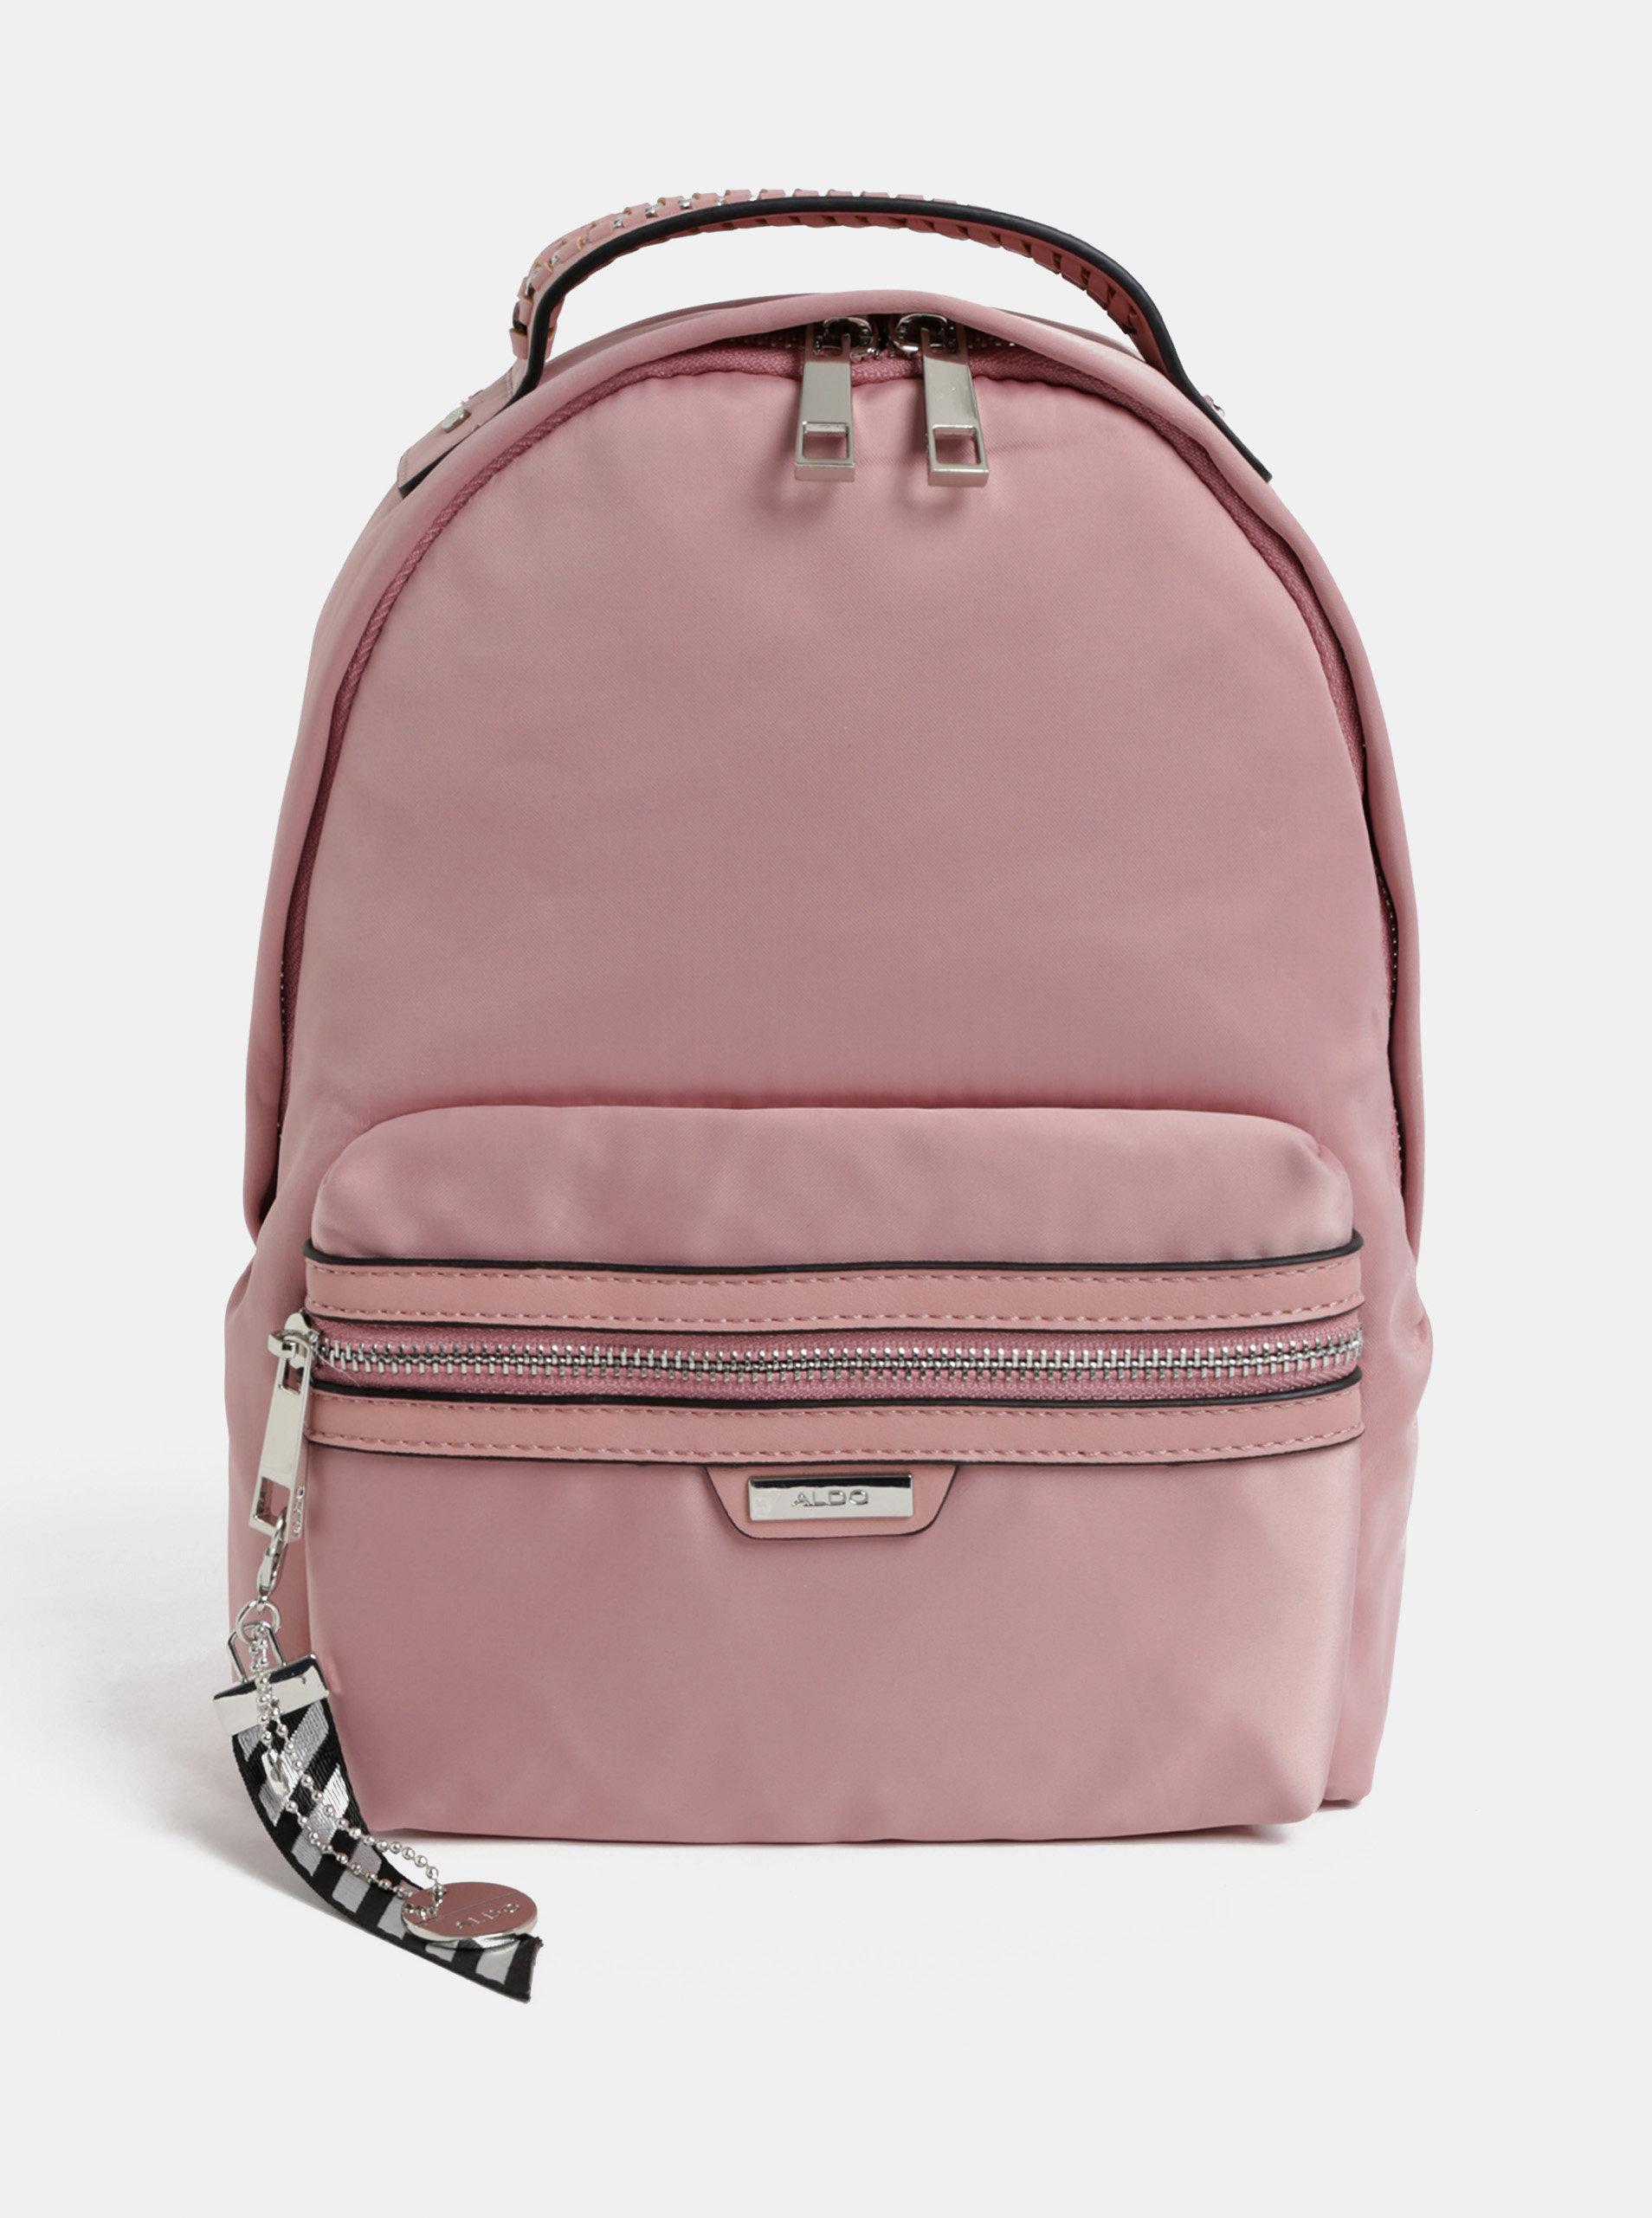 e991bde372d9a Ružový dámsky batoh ALDO | ZOOT.sk